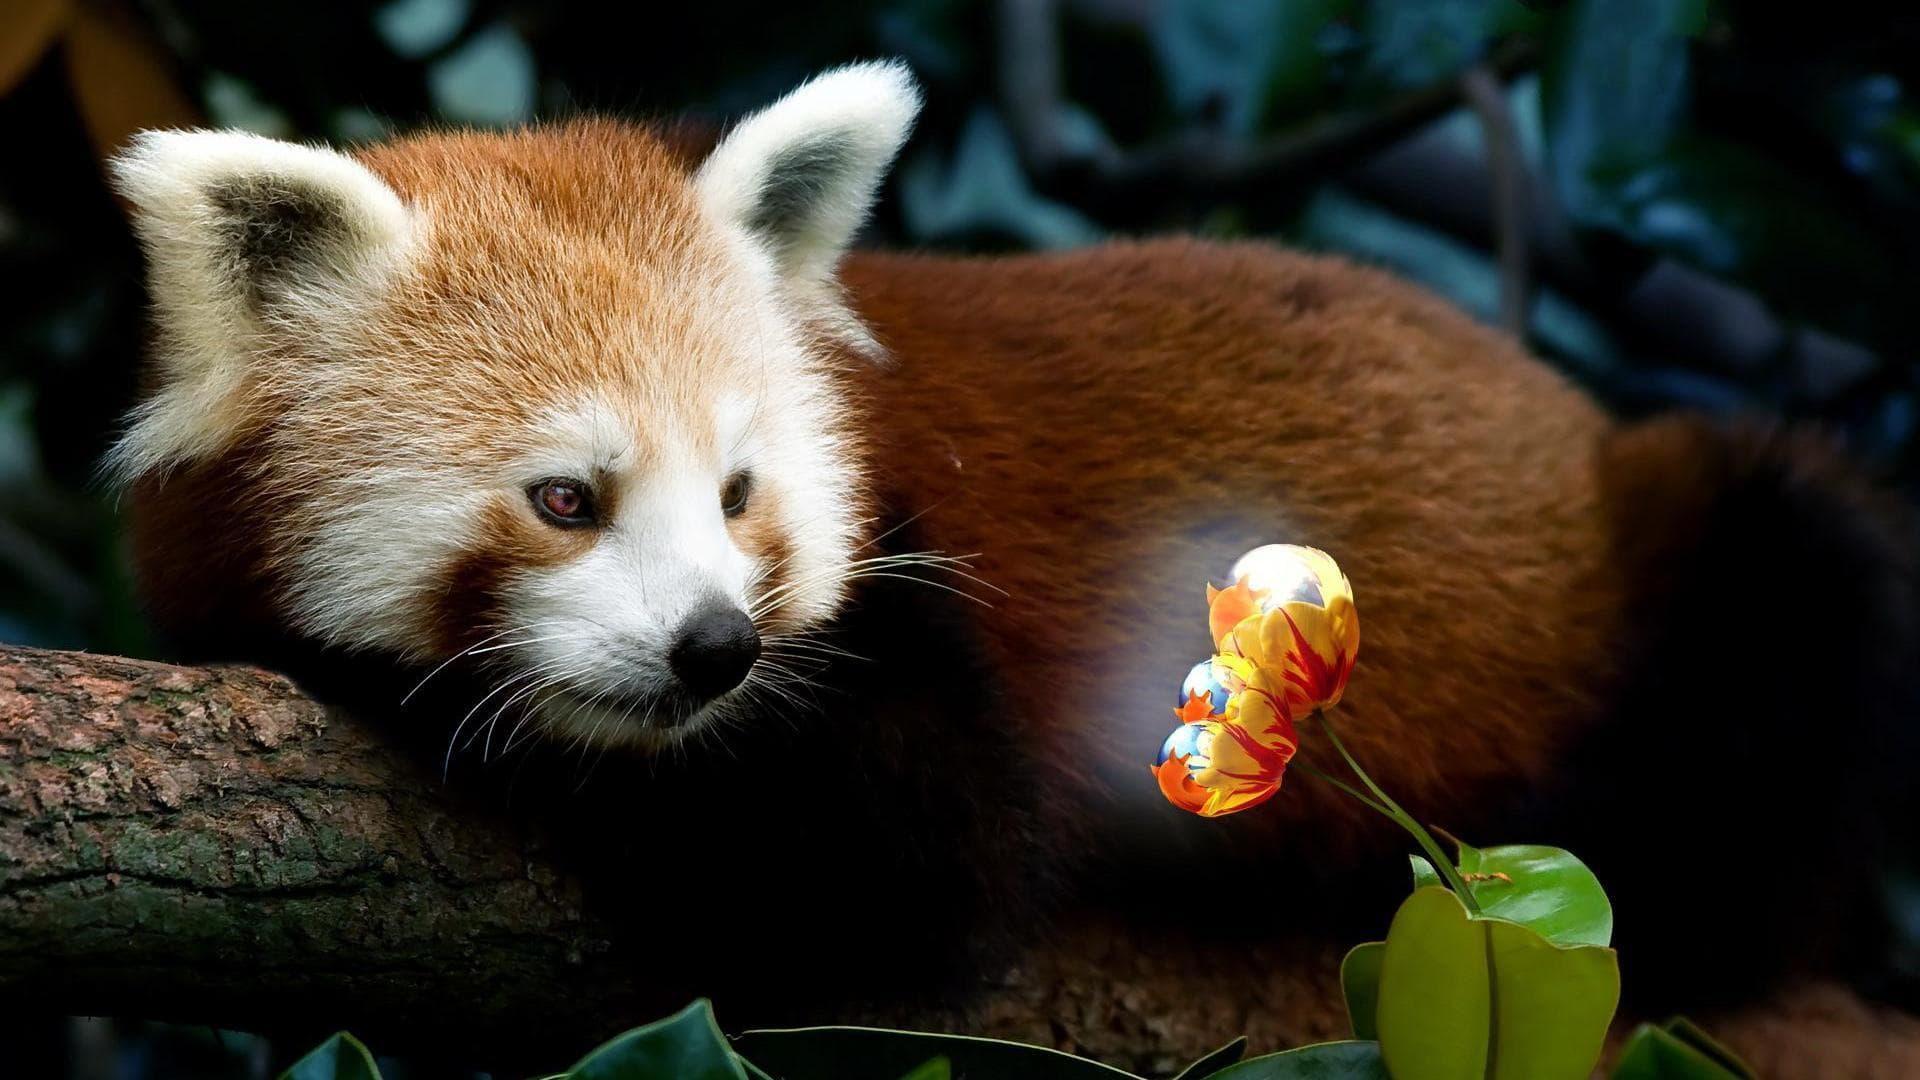 Red Panda Hd Wallpapers 7wallpapersnet